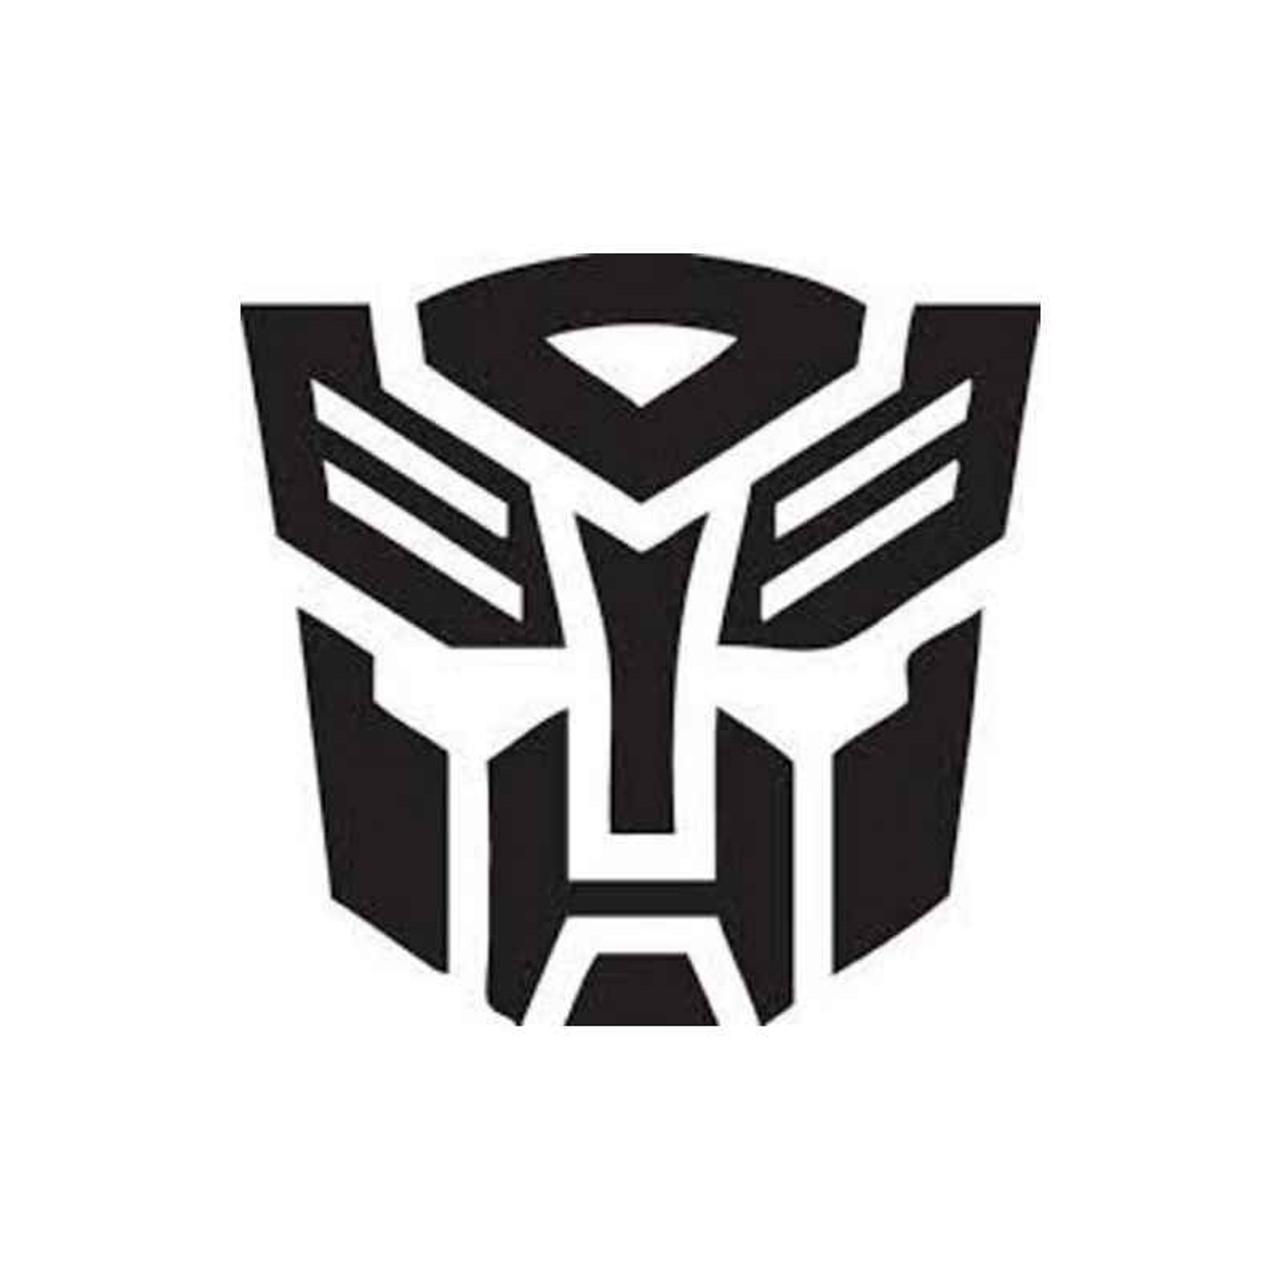 Transformers Autobots Bumblebee Logo Decal